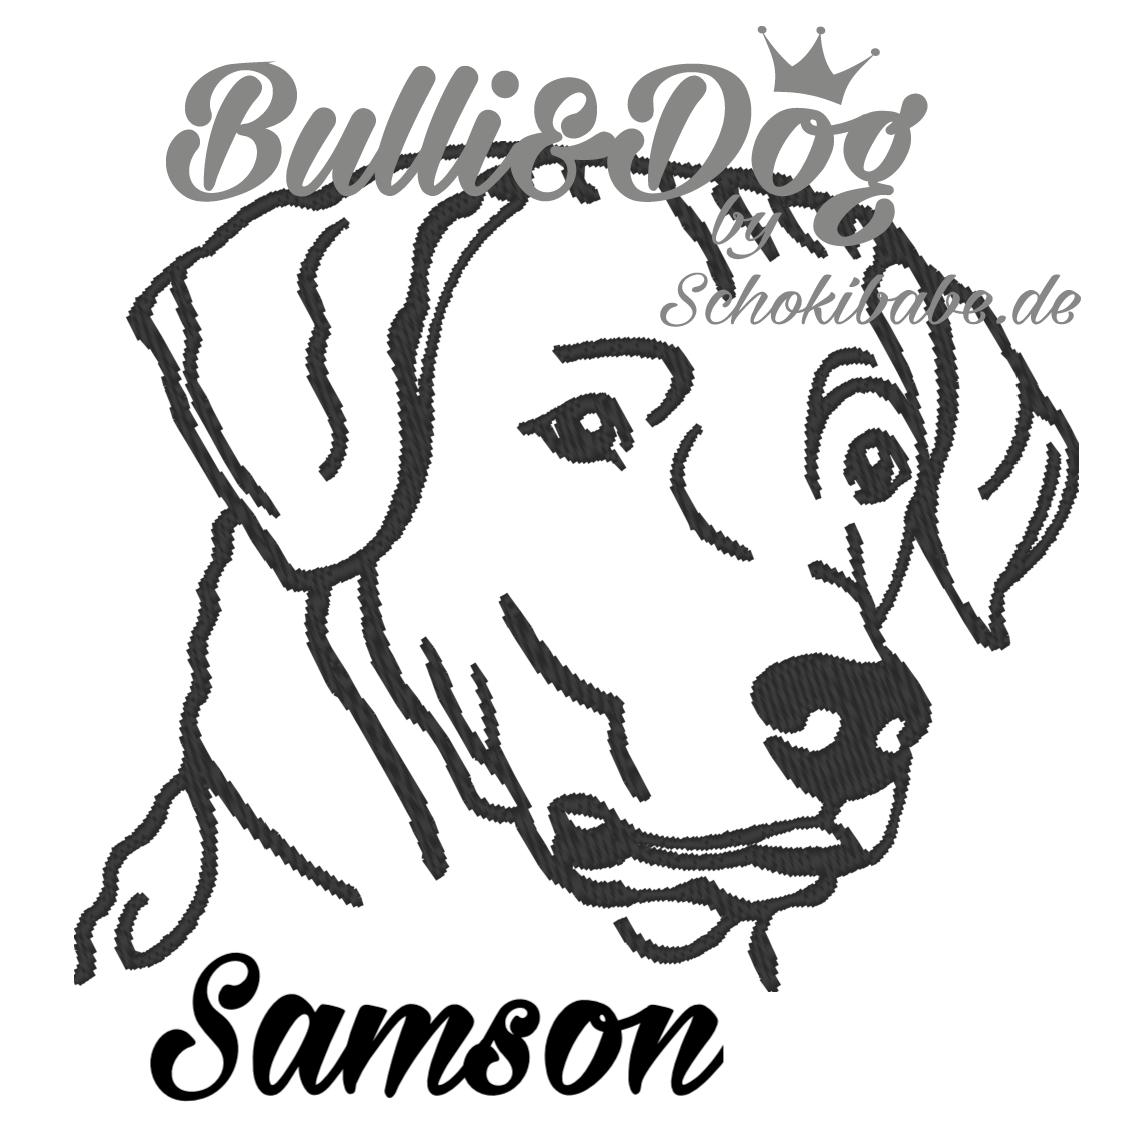 Samson_8x7